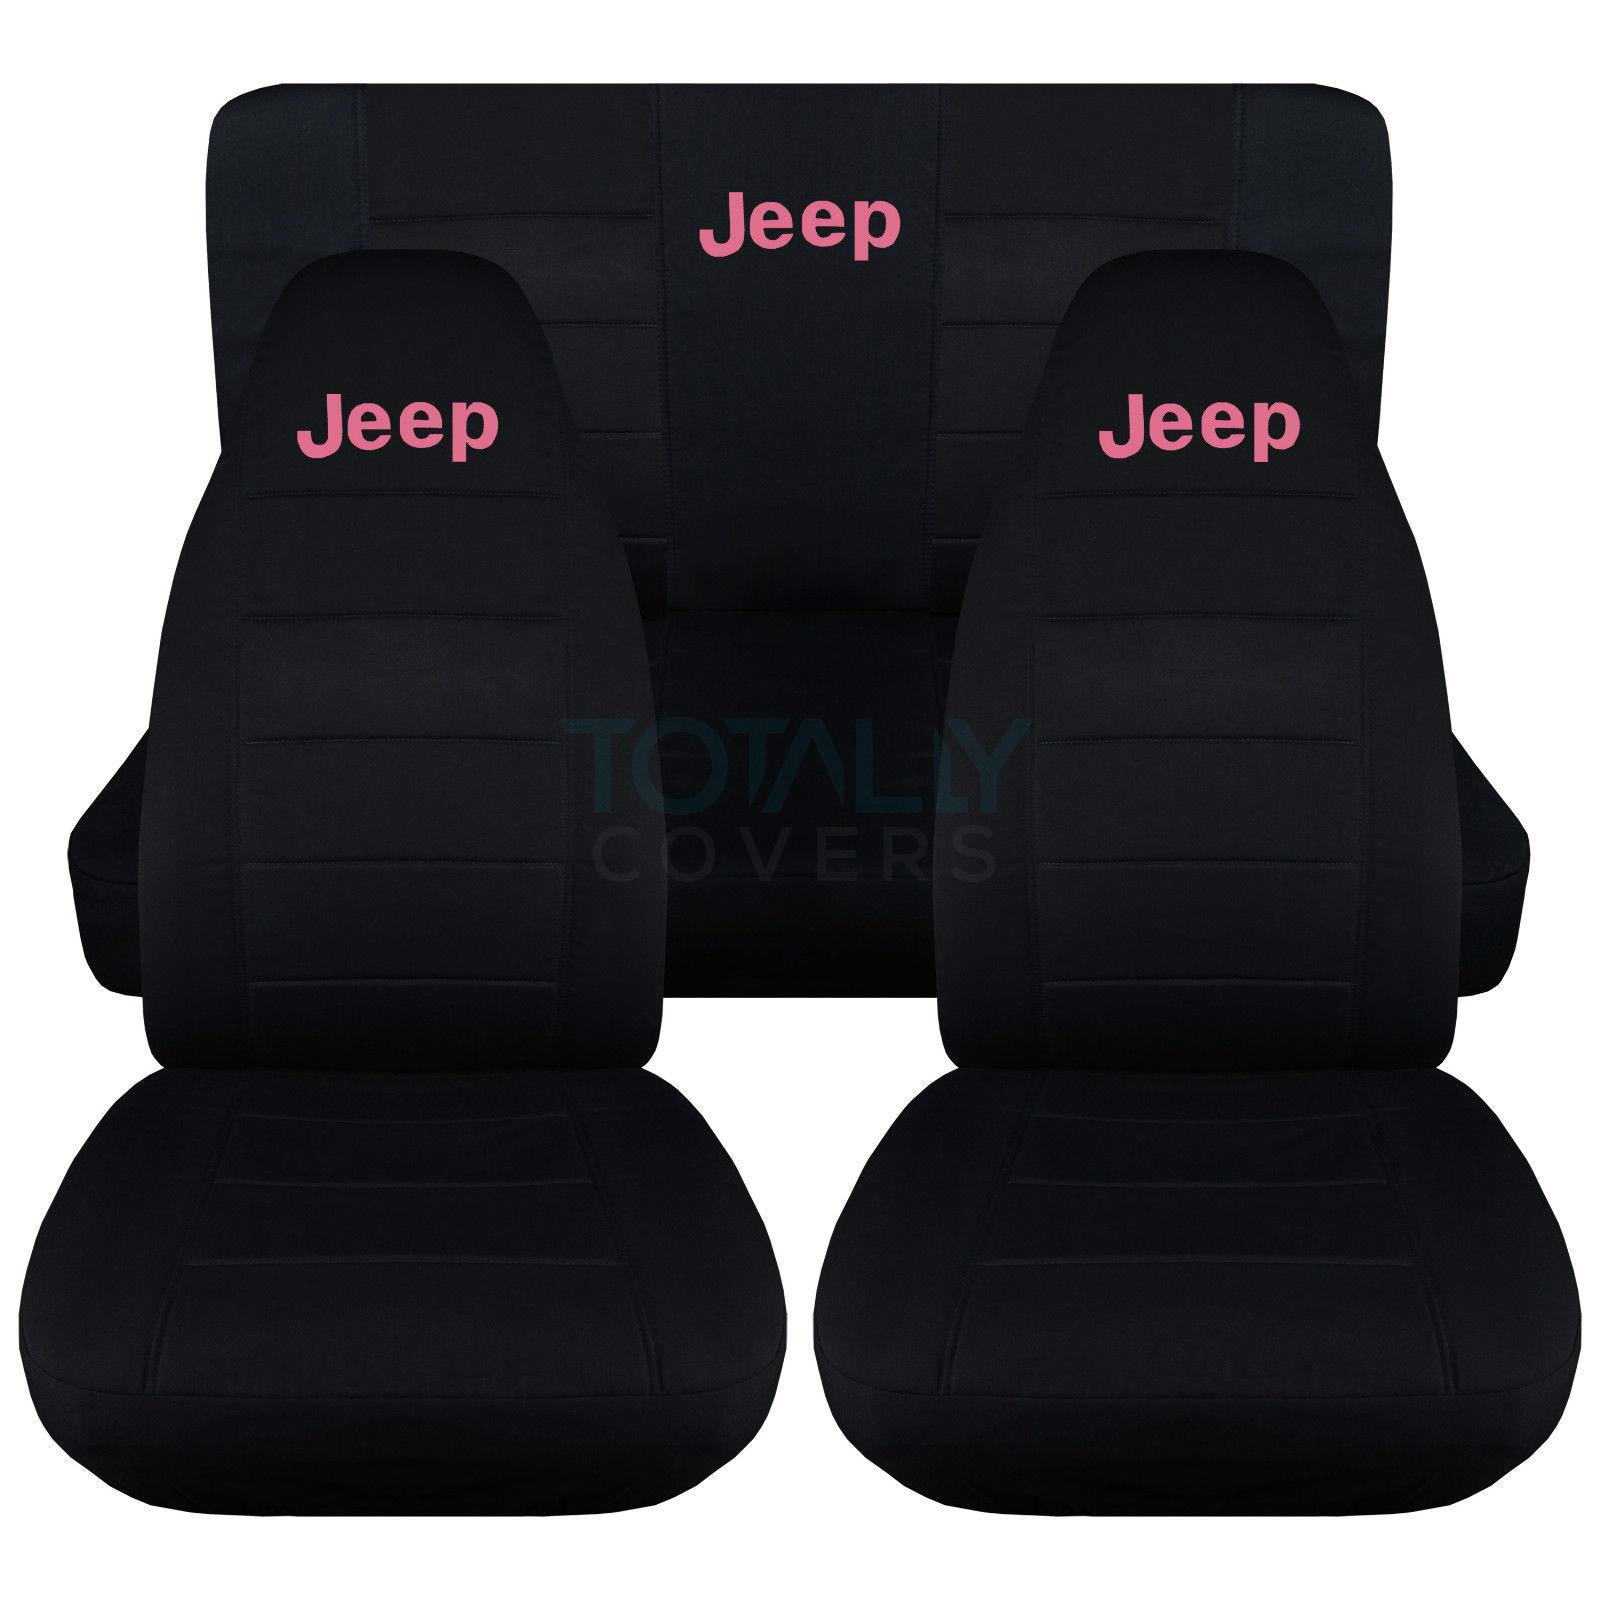 jeep wrangler yj/tj/jk 1987-2017 black seat covers w logo front